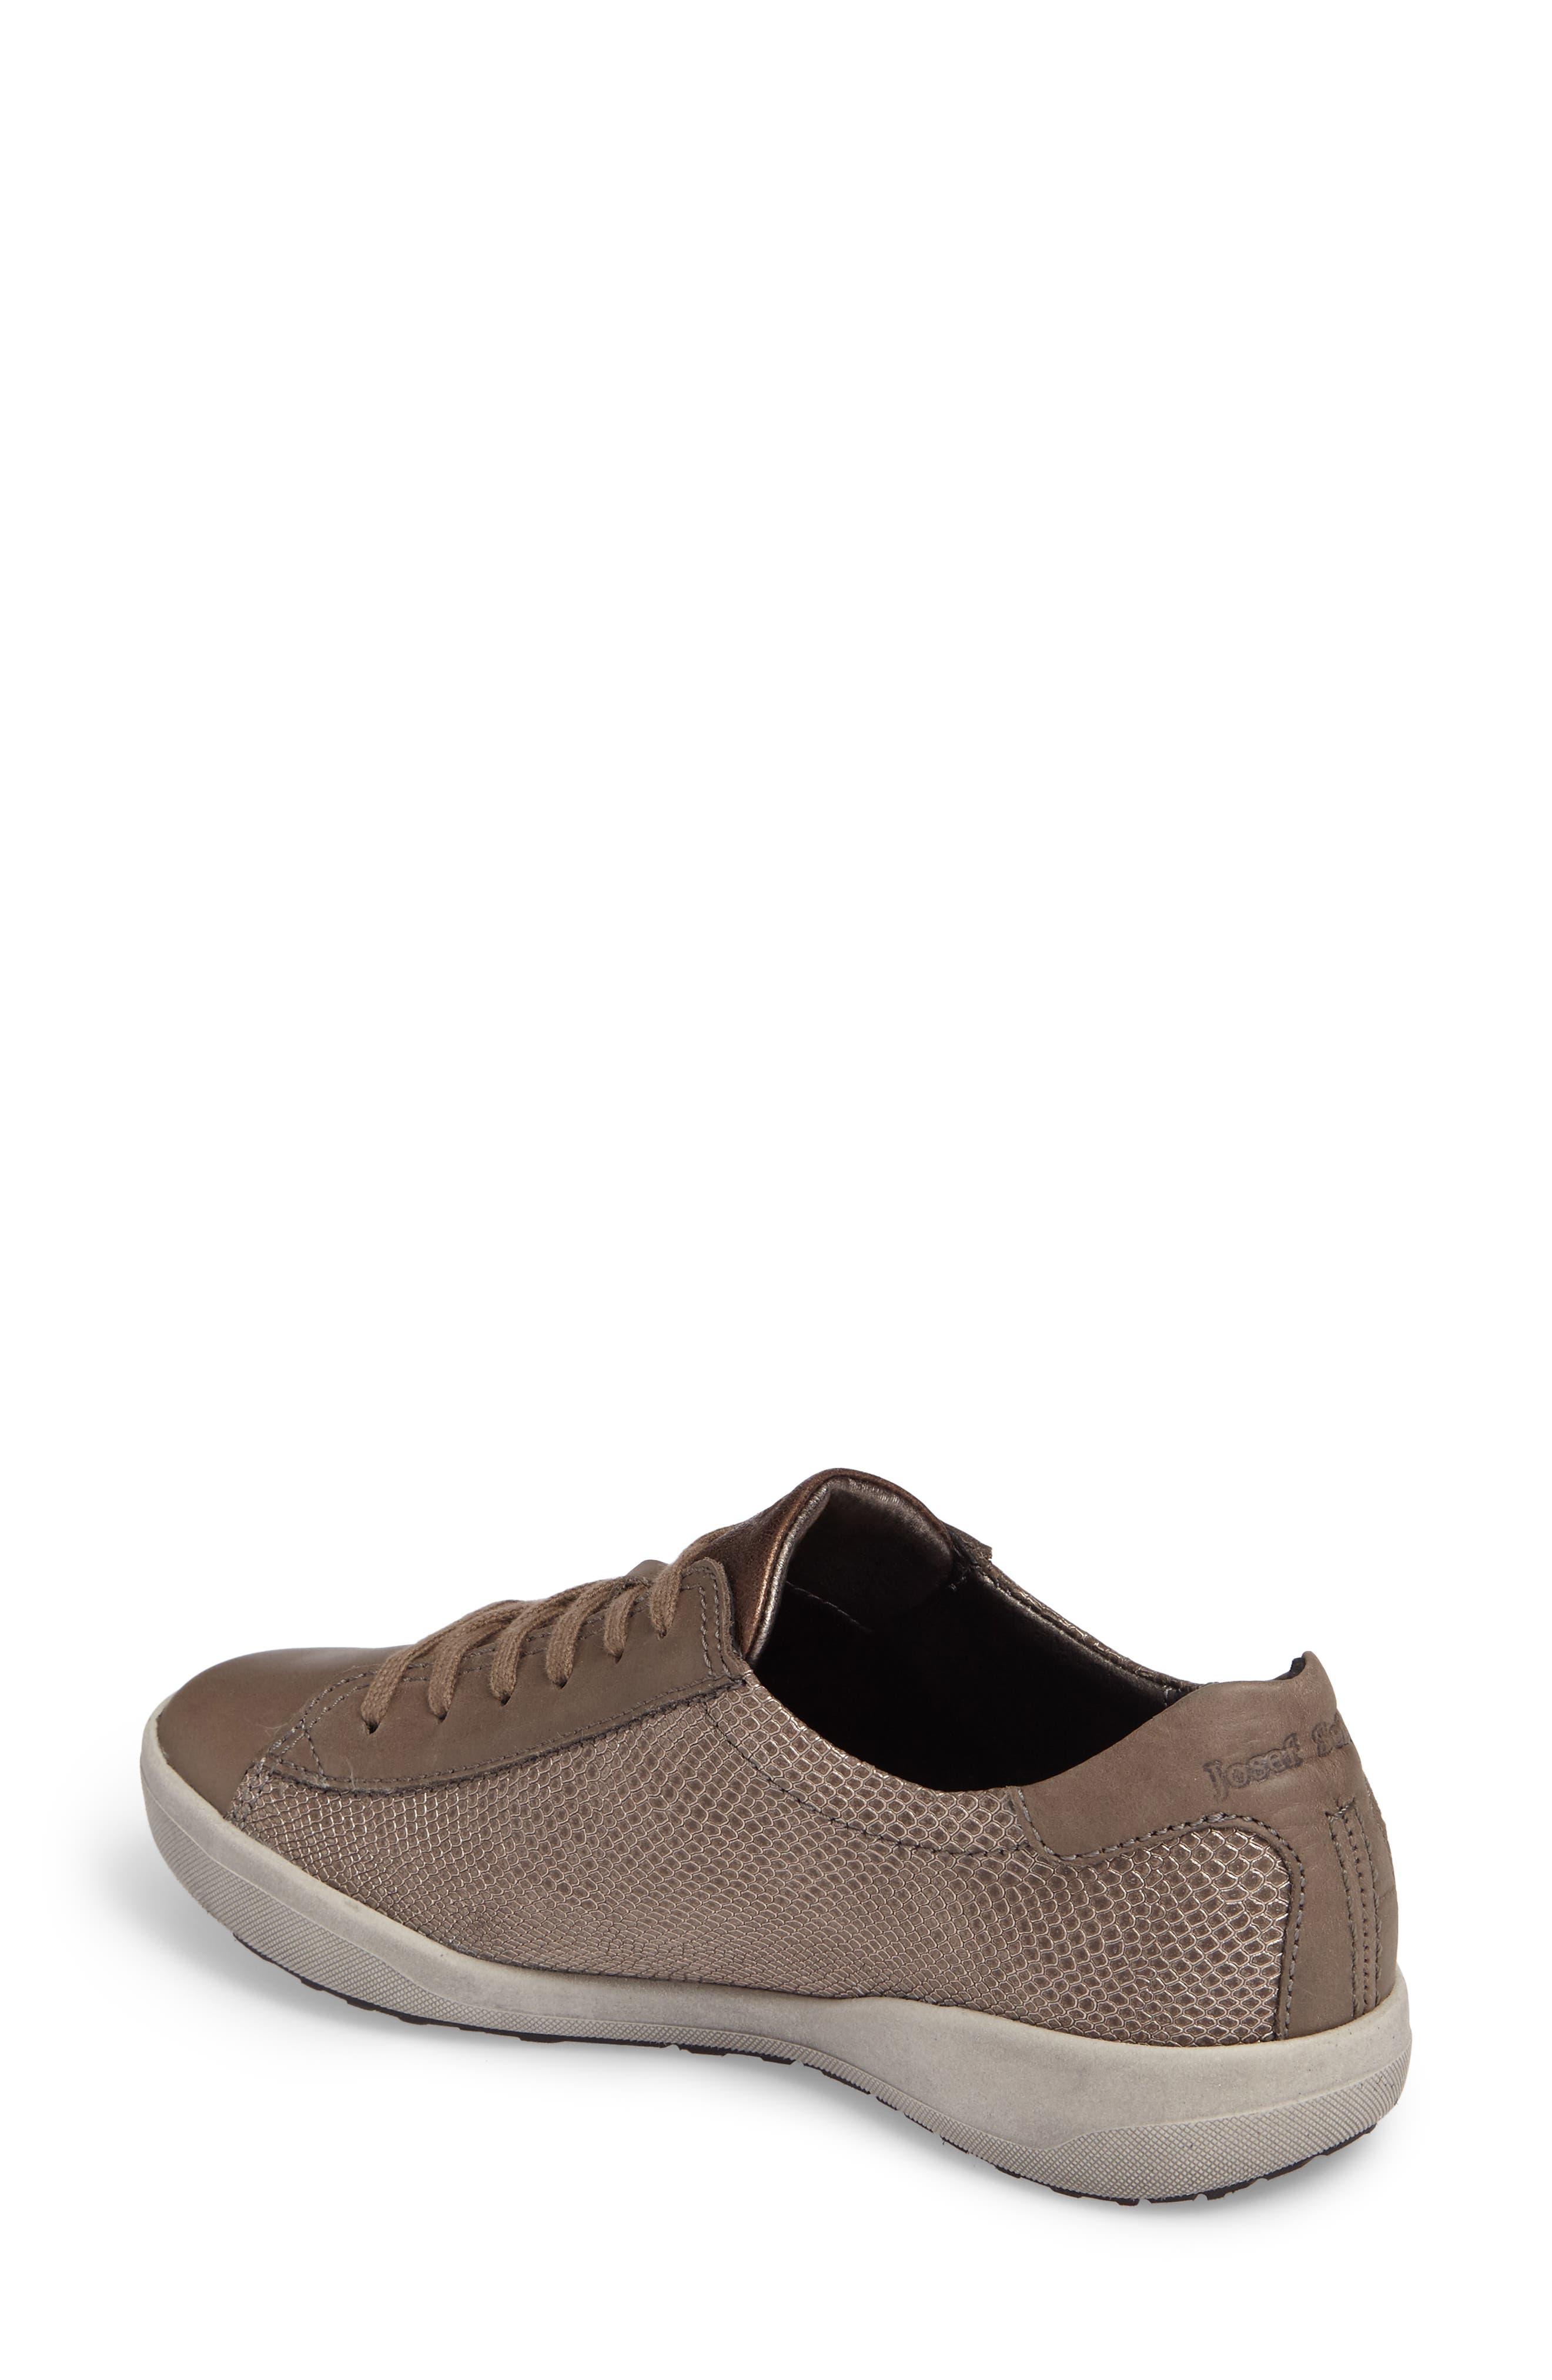 Sina 27 Sneaker,                             Alternate thumbnail 2, color,